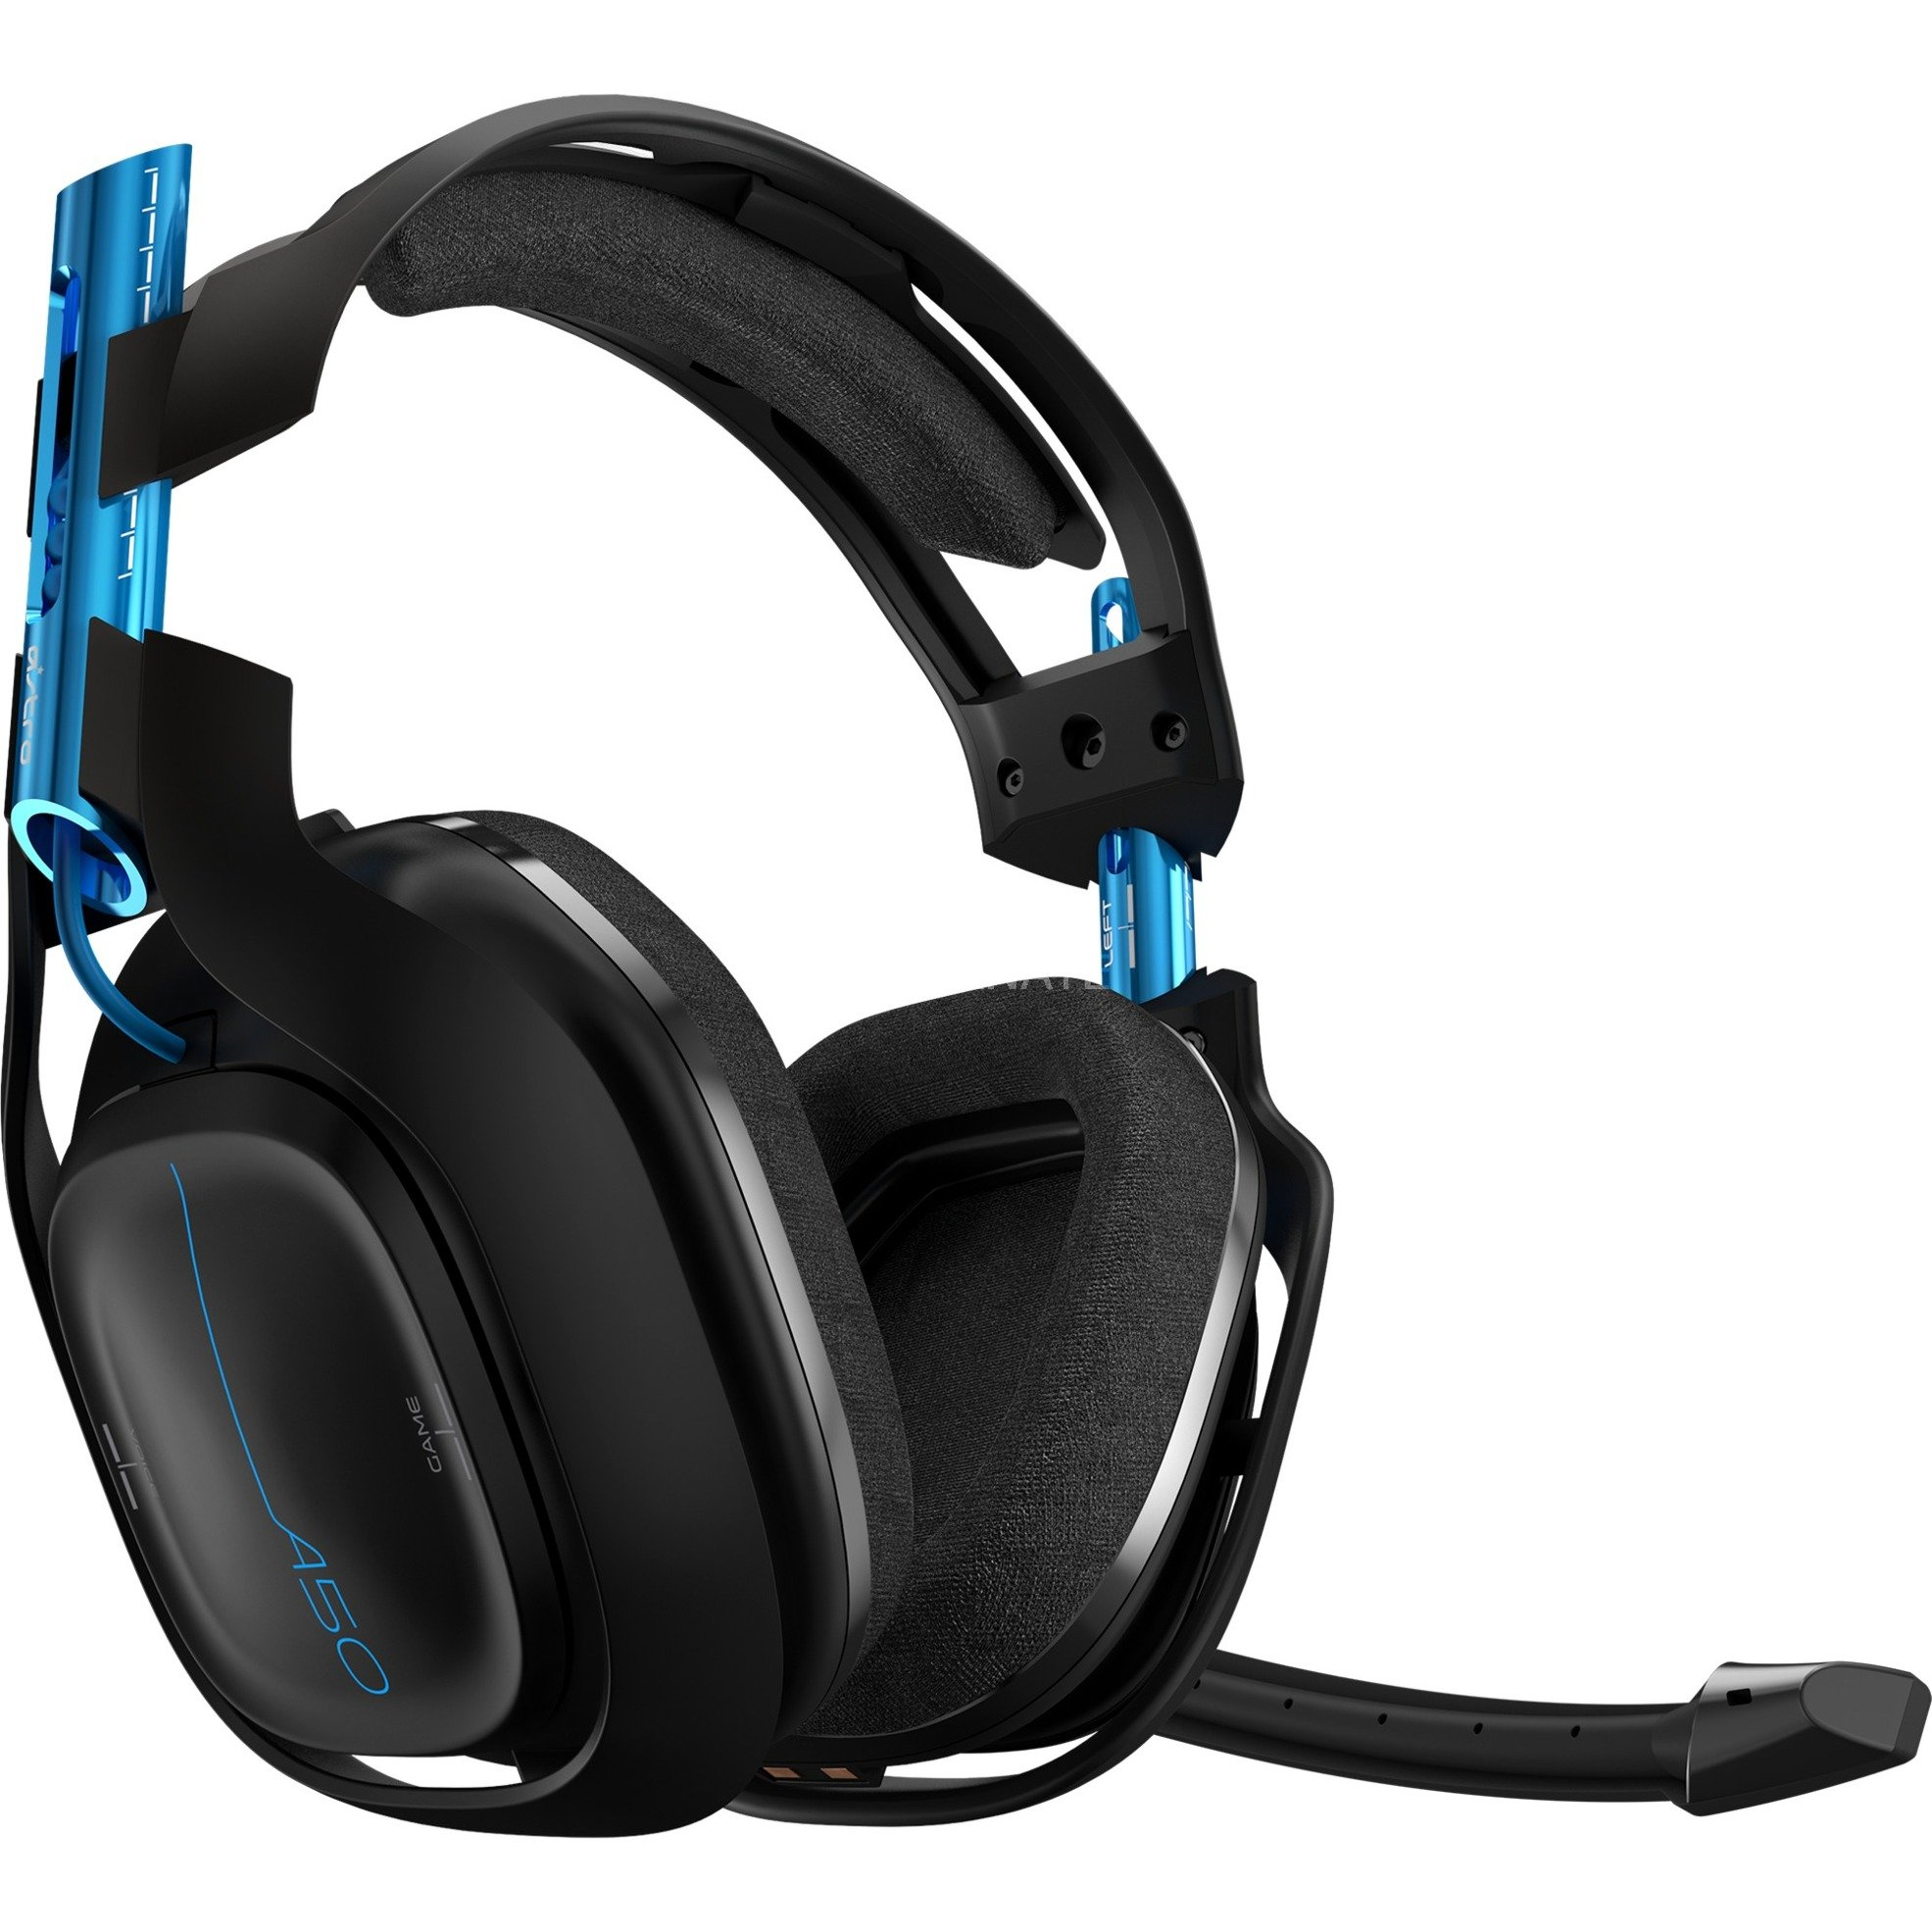 A50 Wireless Binaurale Diadema Negro, Azul auricular con micrófono, Auriculares con micrófono